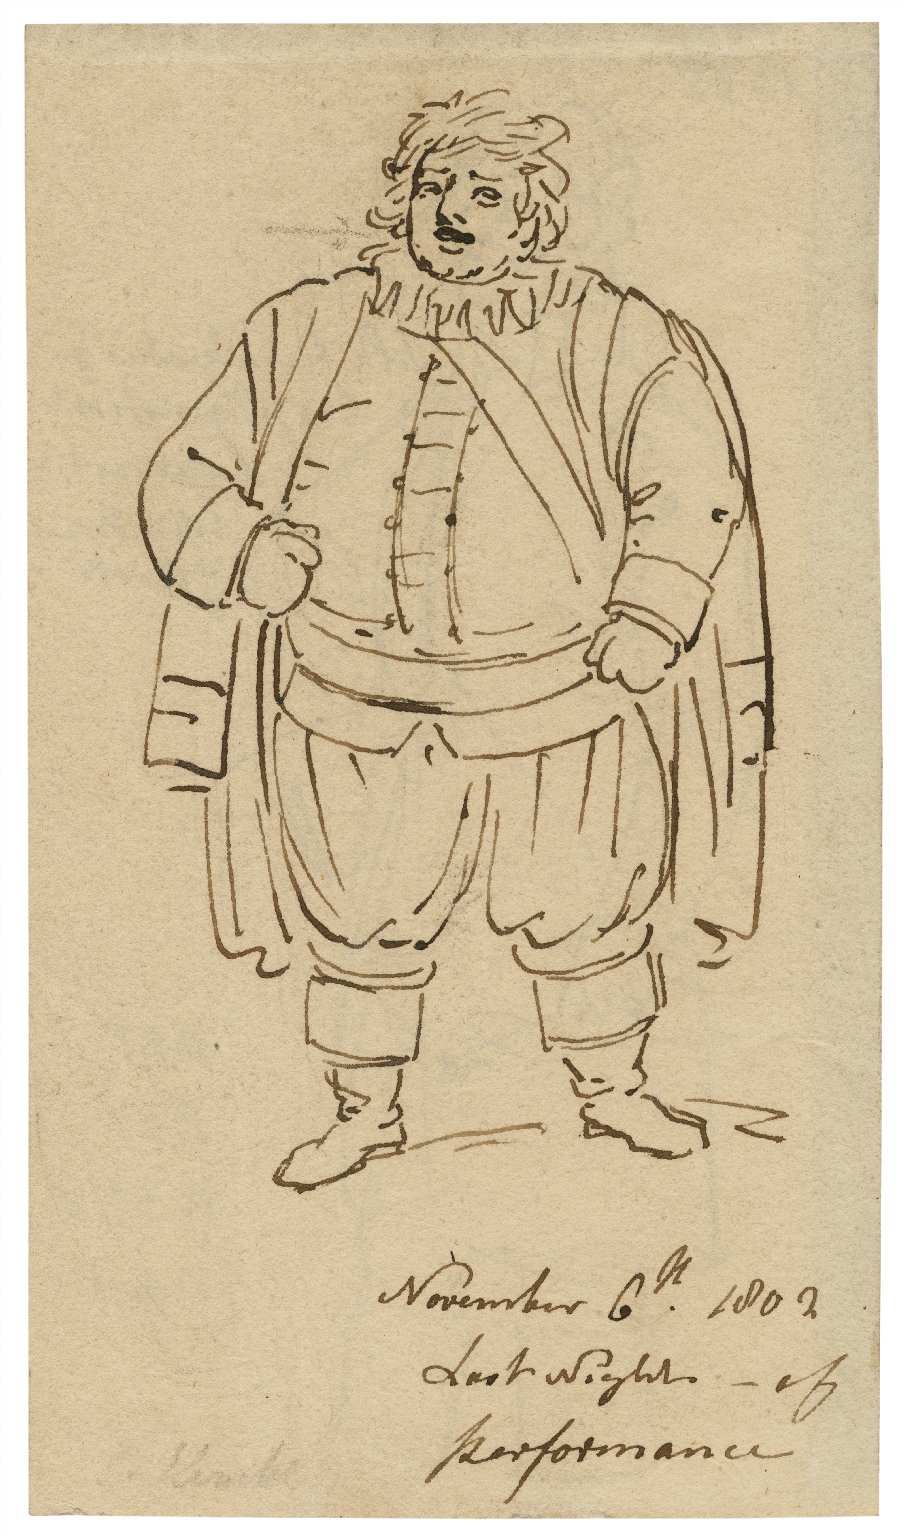 [King Henry IV, pt.1, Stephen Kemble as Falstaff] [graphic].